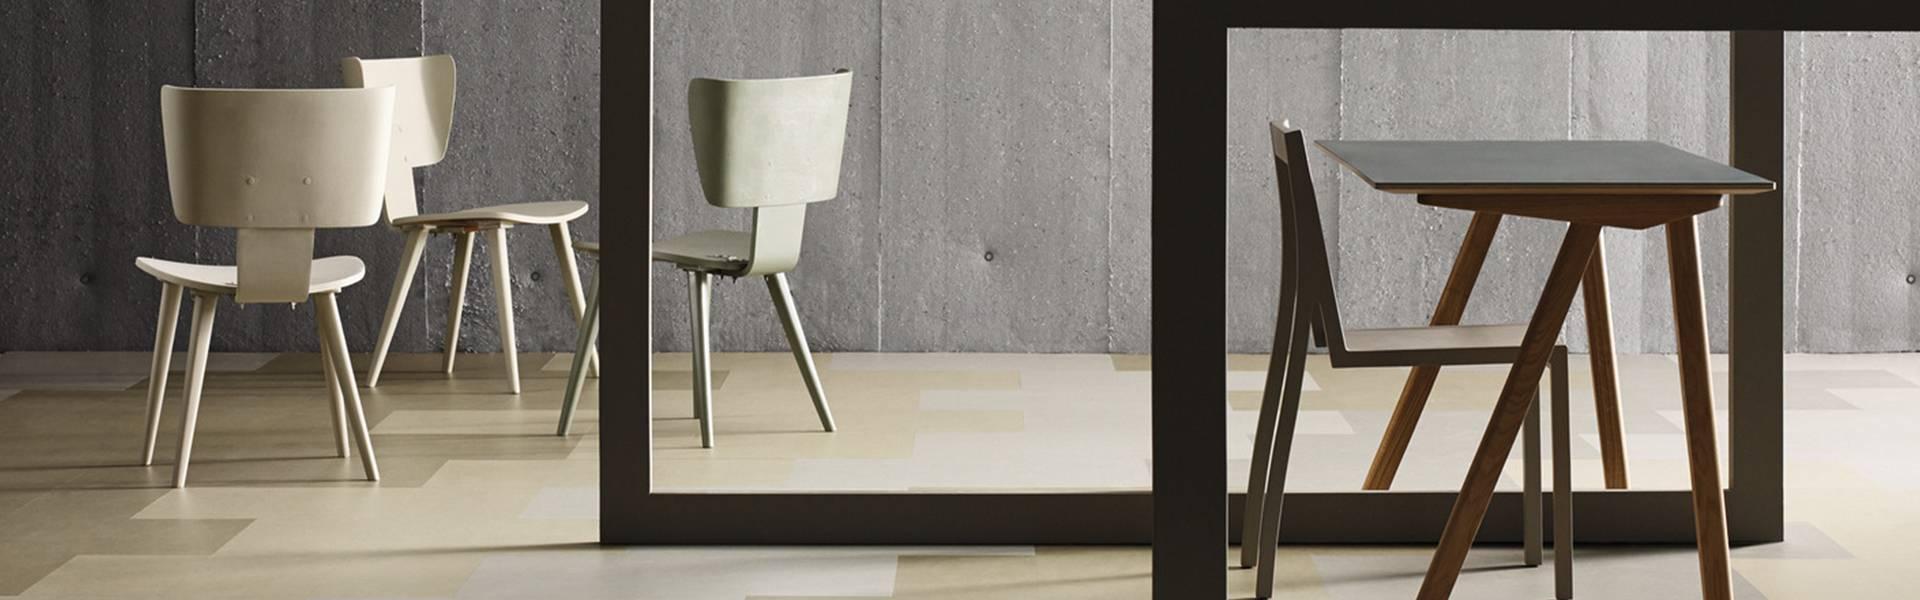 claire-tondeleir-design-meubels